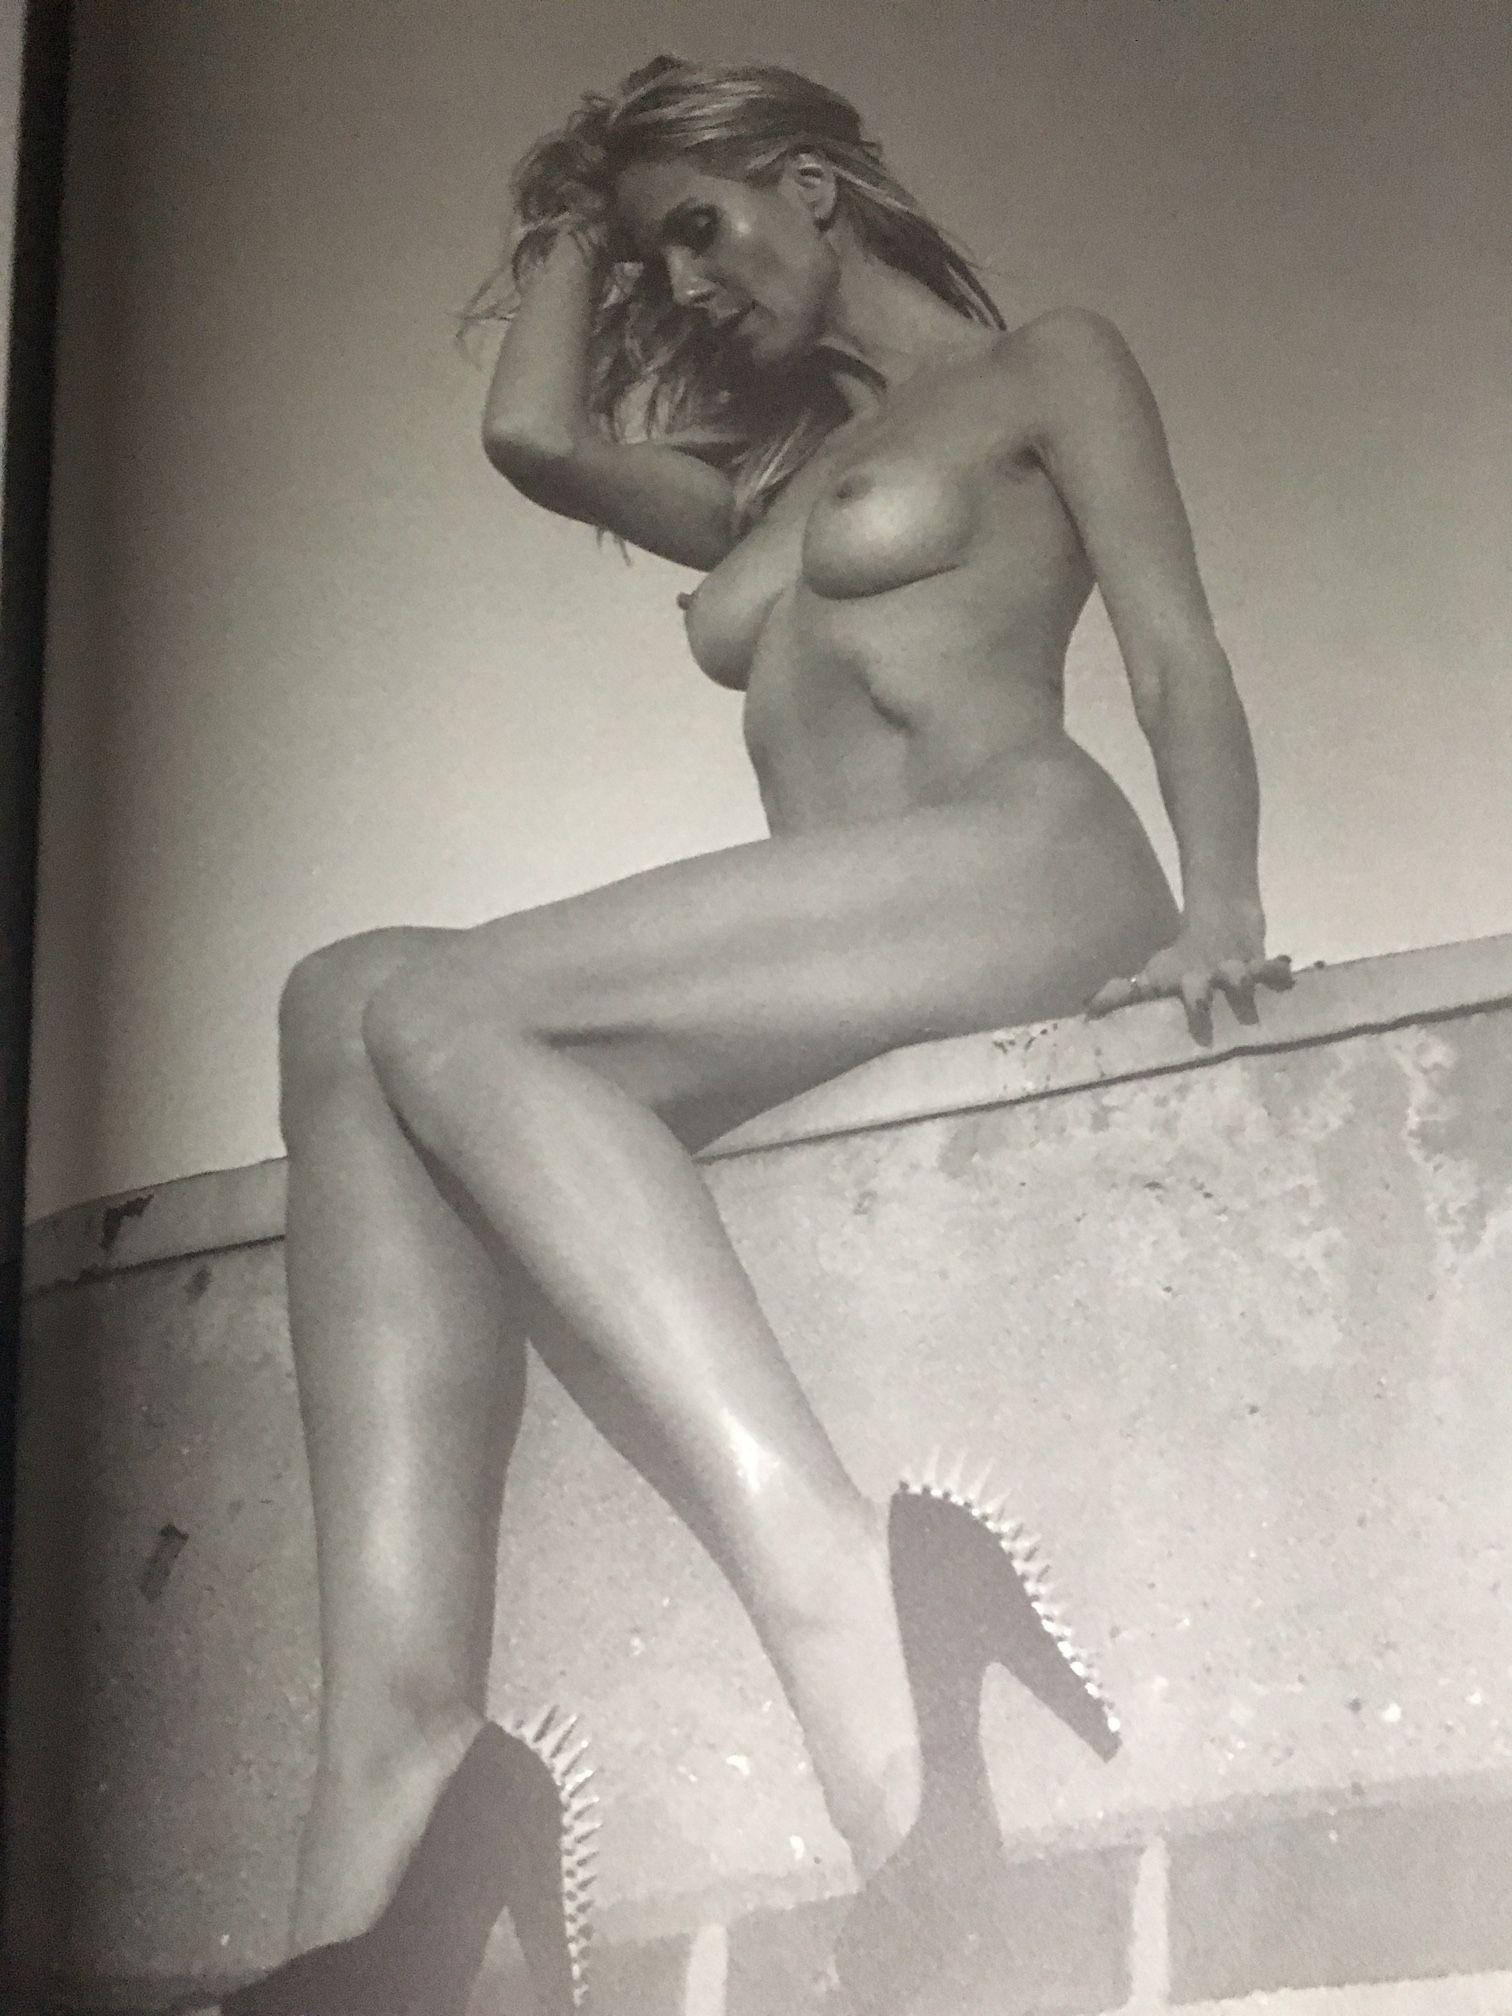 Heidi klum nude photos encyclopedia thumbs